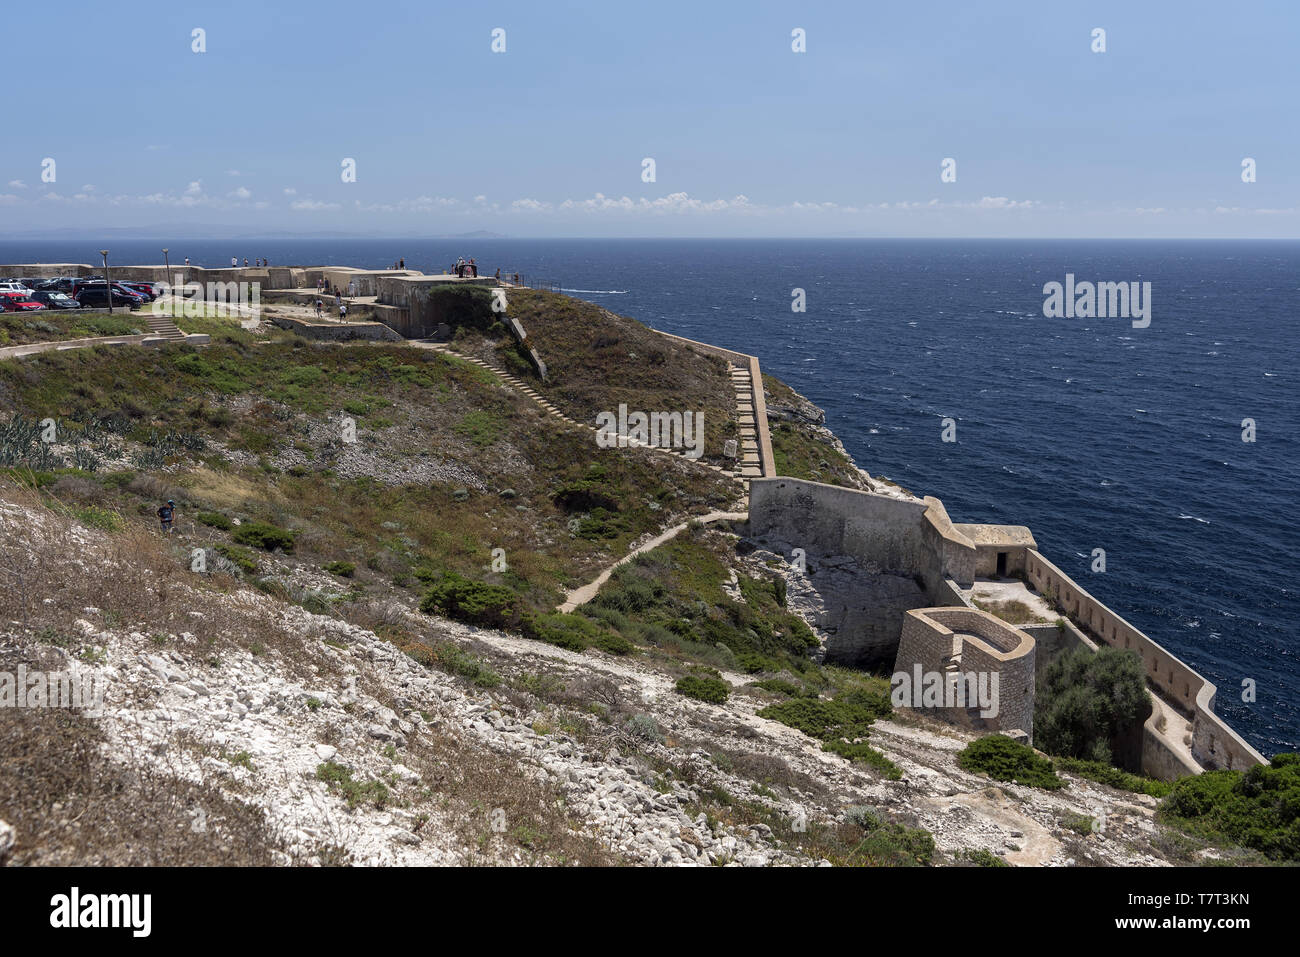 Coastal fortifications on the hill in Bonifacio. Küstenbefestigungen auf dem Hügel in Bonifacio. Nadmorskie fortyfikacje obronne na wzgórzu. - Stock Image